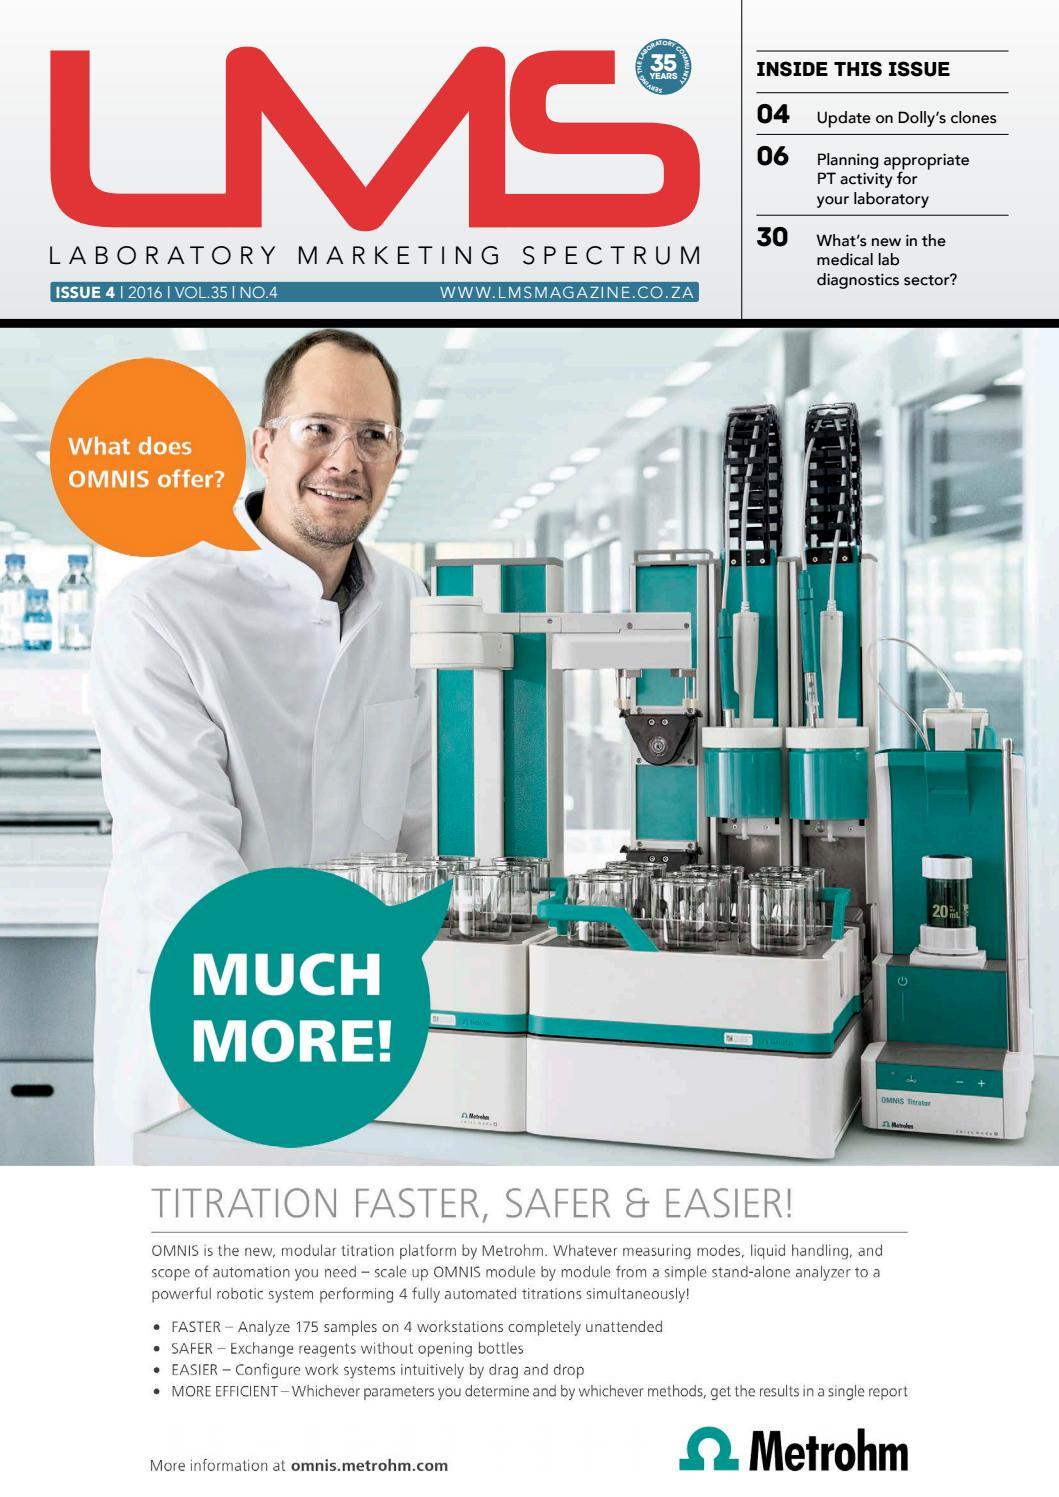 Lms Issue 4 2016 By New Media Publishing B2b Issuu Dryer Wiring Ecn Electrical Forums